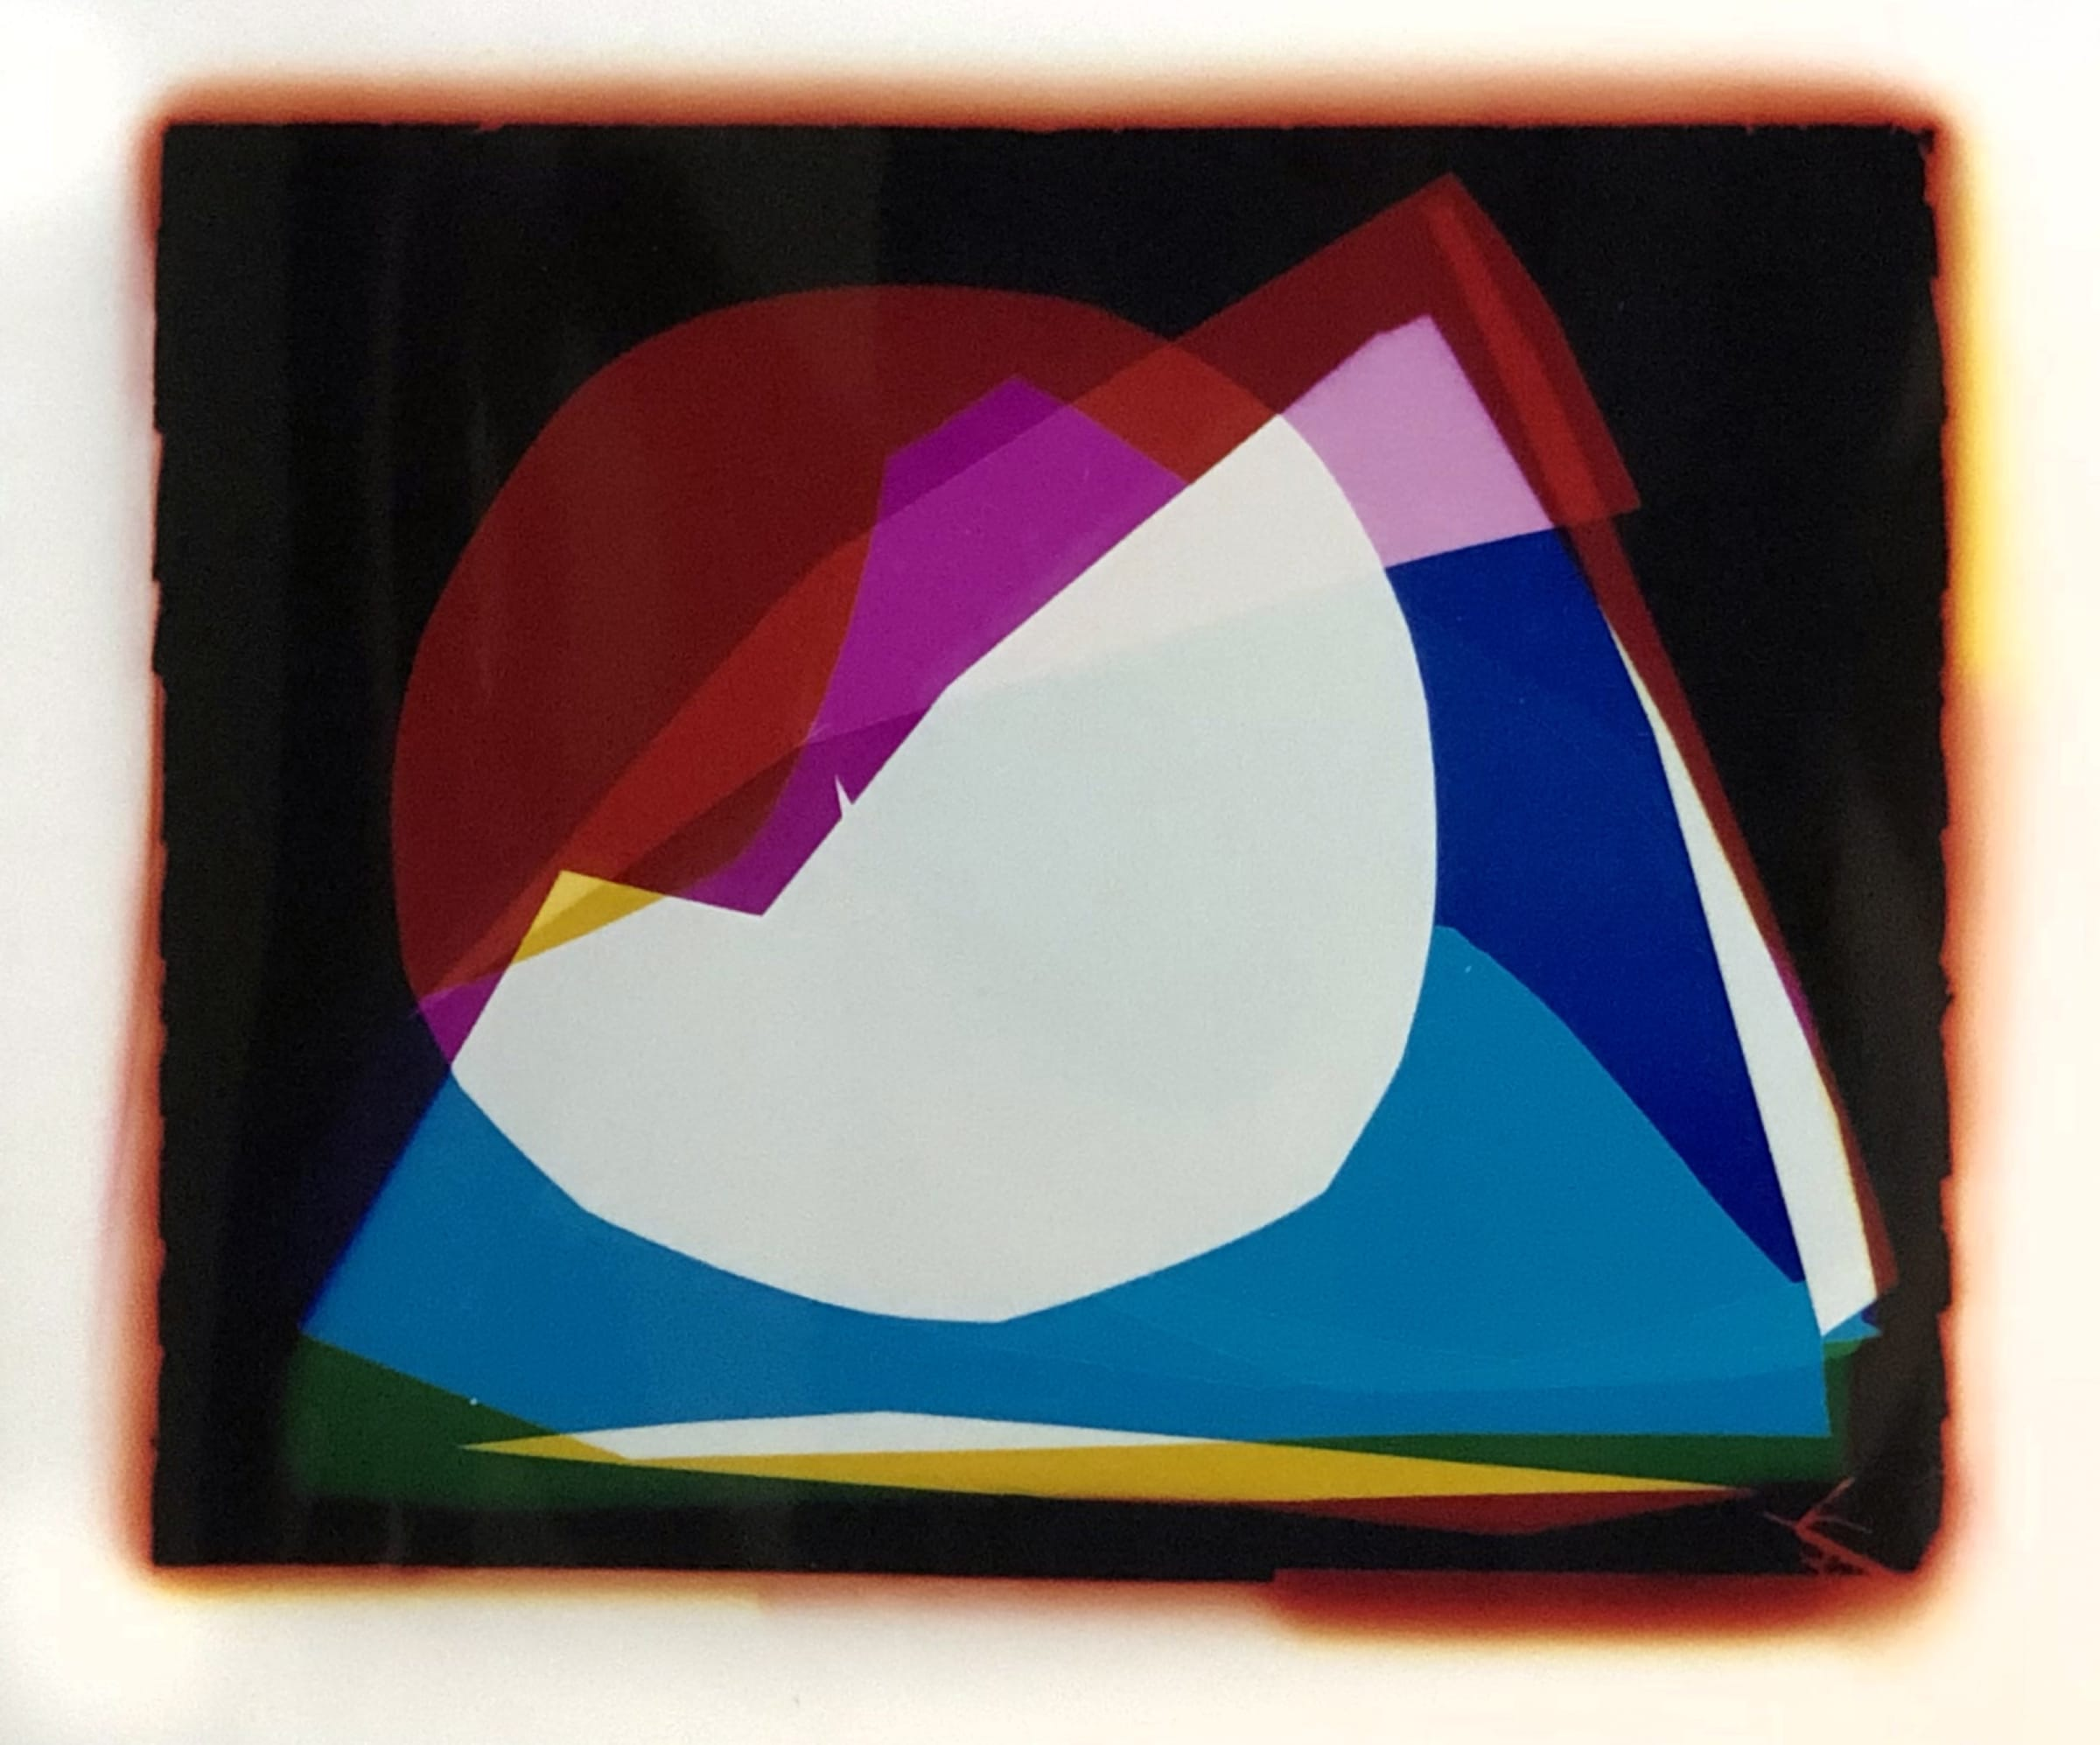 "<span class=""link fancybox-details-link""><a href=""/artists/26-liz-nielsen/works/349-liz-nielsen-full-moon-mountain-2019/"">View Detail Page</a></span><div class=""artist""><strong>Liz Nielsen</strong></div> <div class=""title""><em>Full Moon Mountain</em>, 2019</div> <div class=""medium"">Analogue Chromogenic Photogram on Fujiflex<br /> Unique</div> <div class=""dimensions"">10.2 x 12.7 cm<br /> 4 x 5 in<br /> Print only</div><div class=""copyright_line"">Copyright Liz Nielsen</div>"